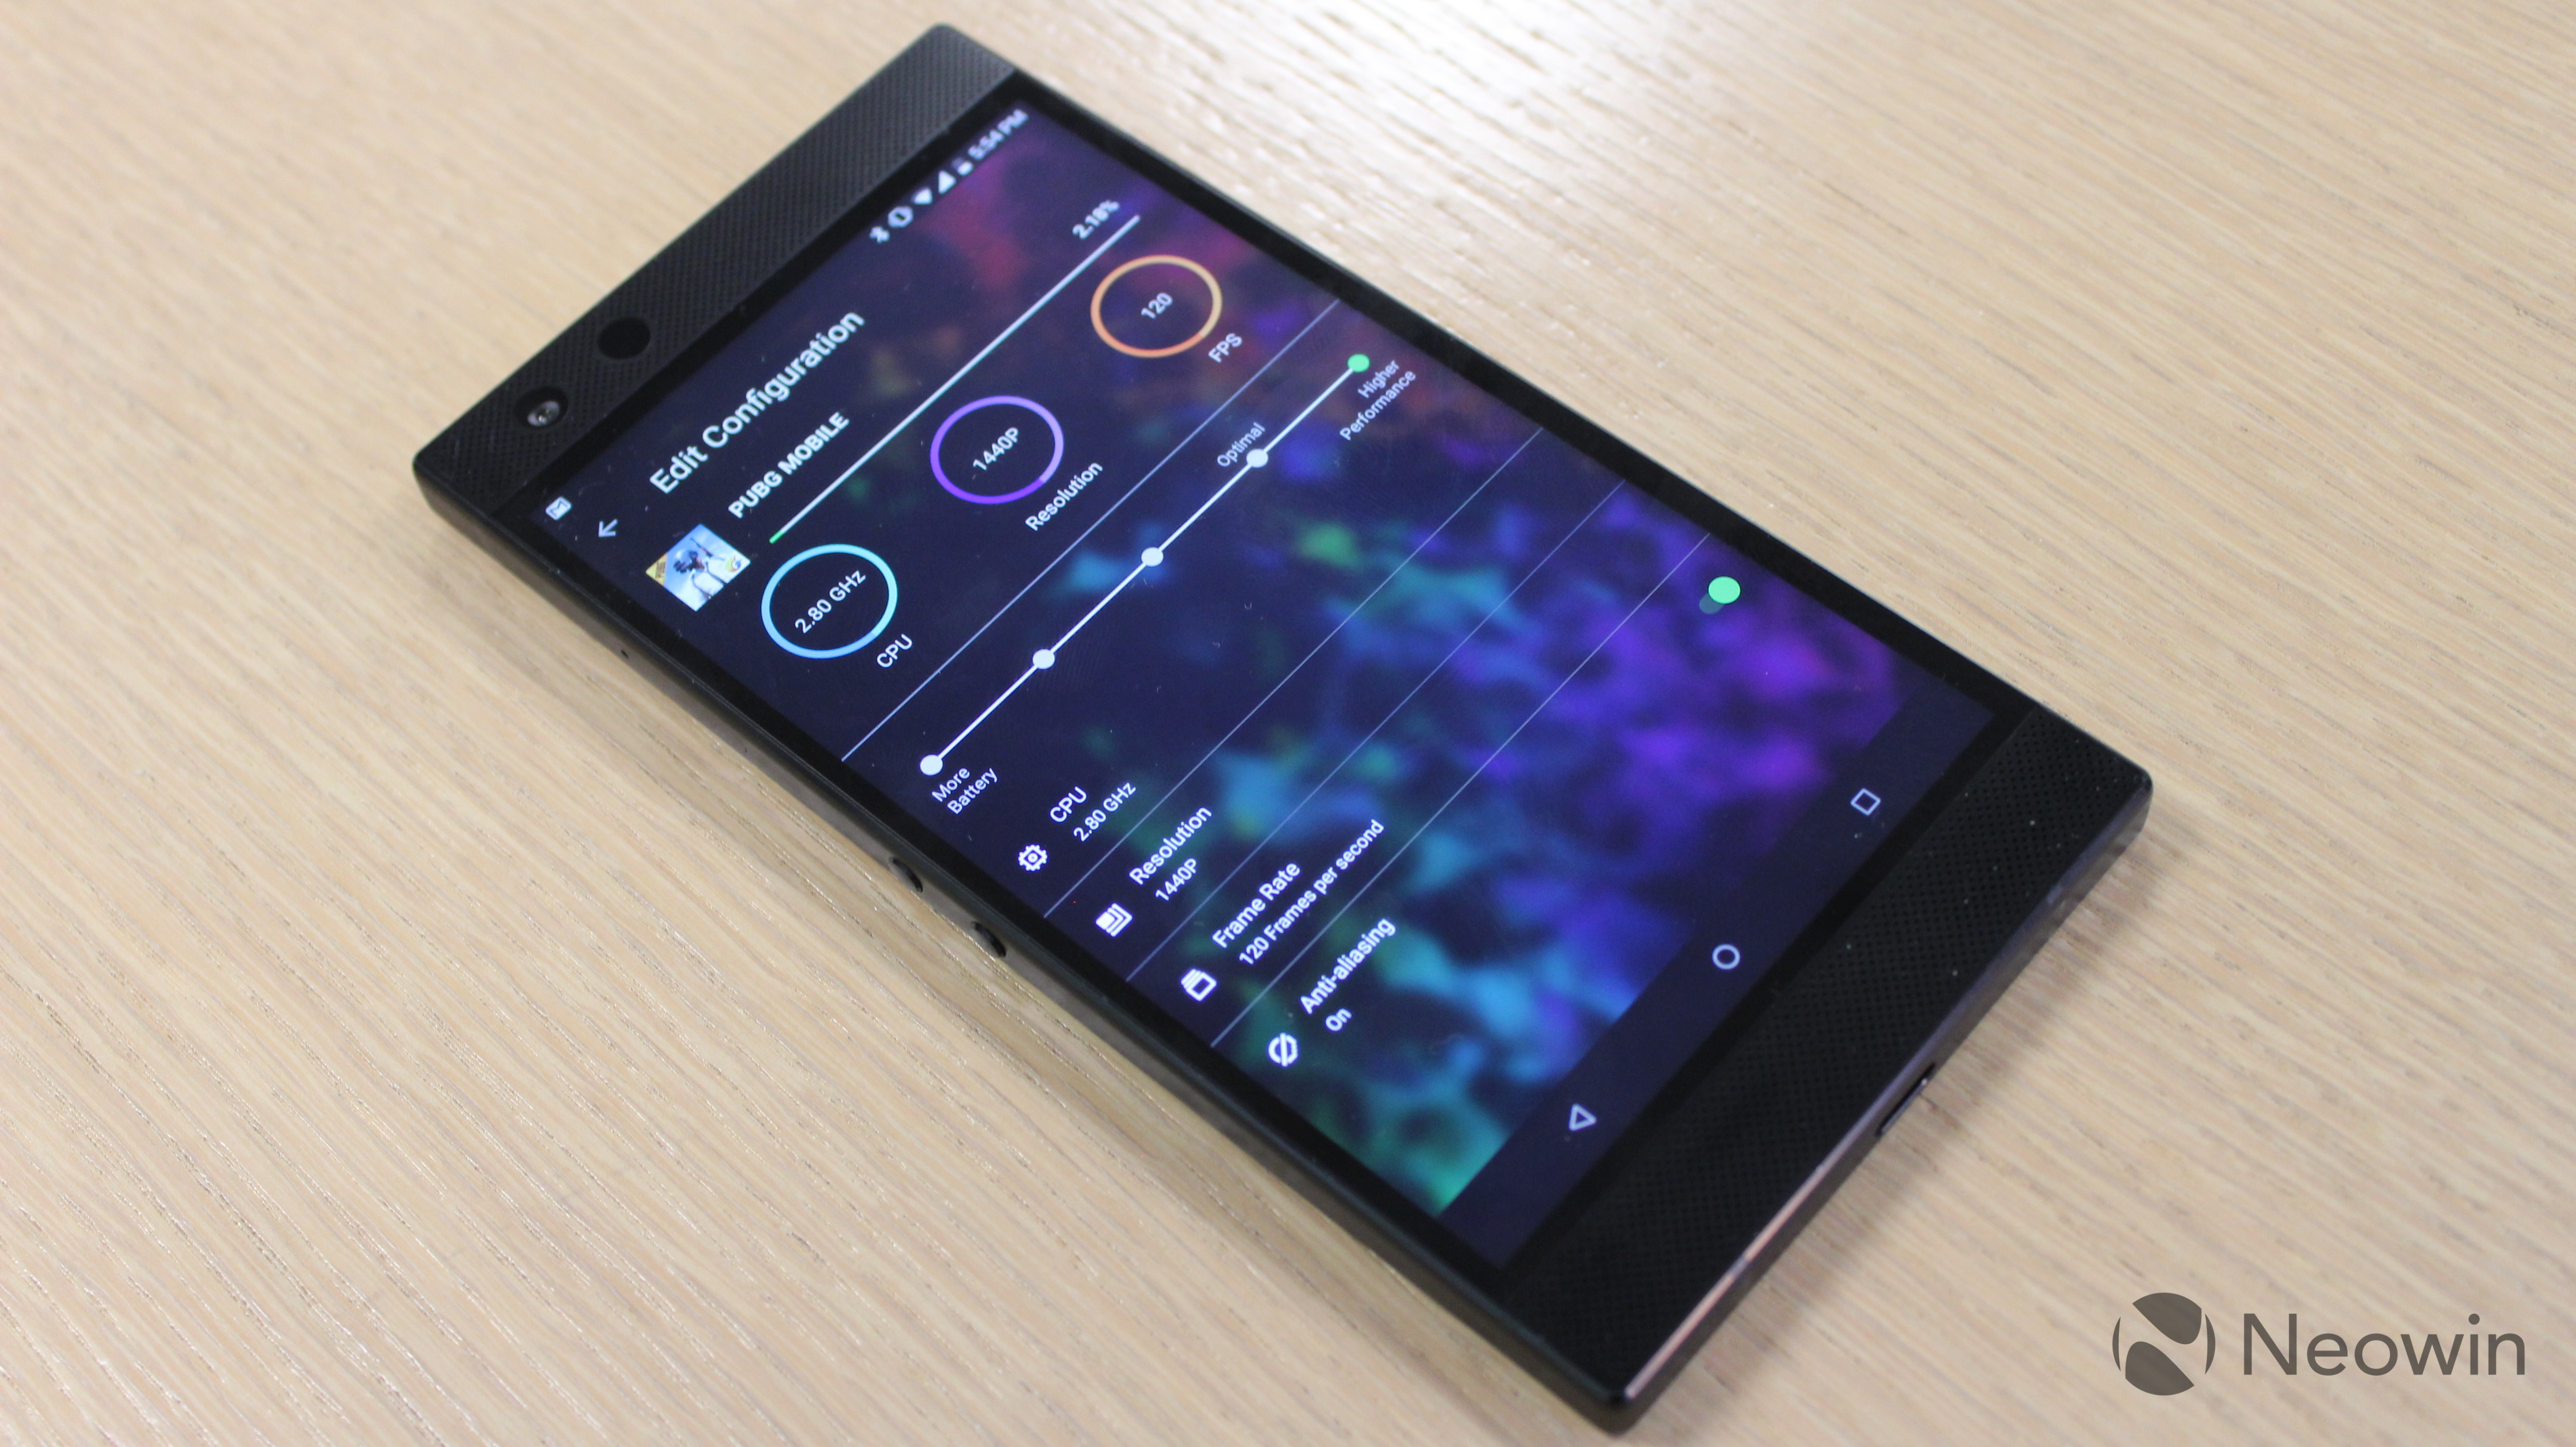 Razer announces the Razer Phone 2 with Chroma lighting